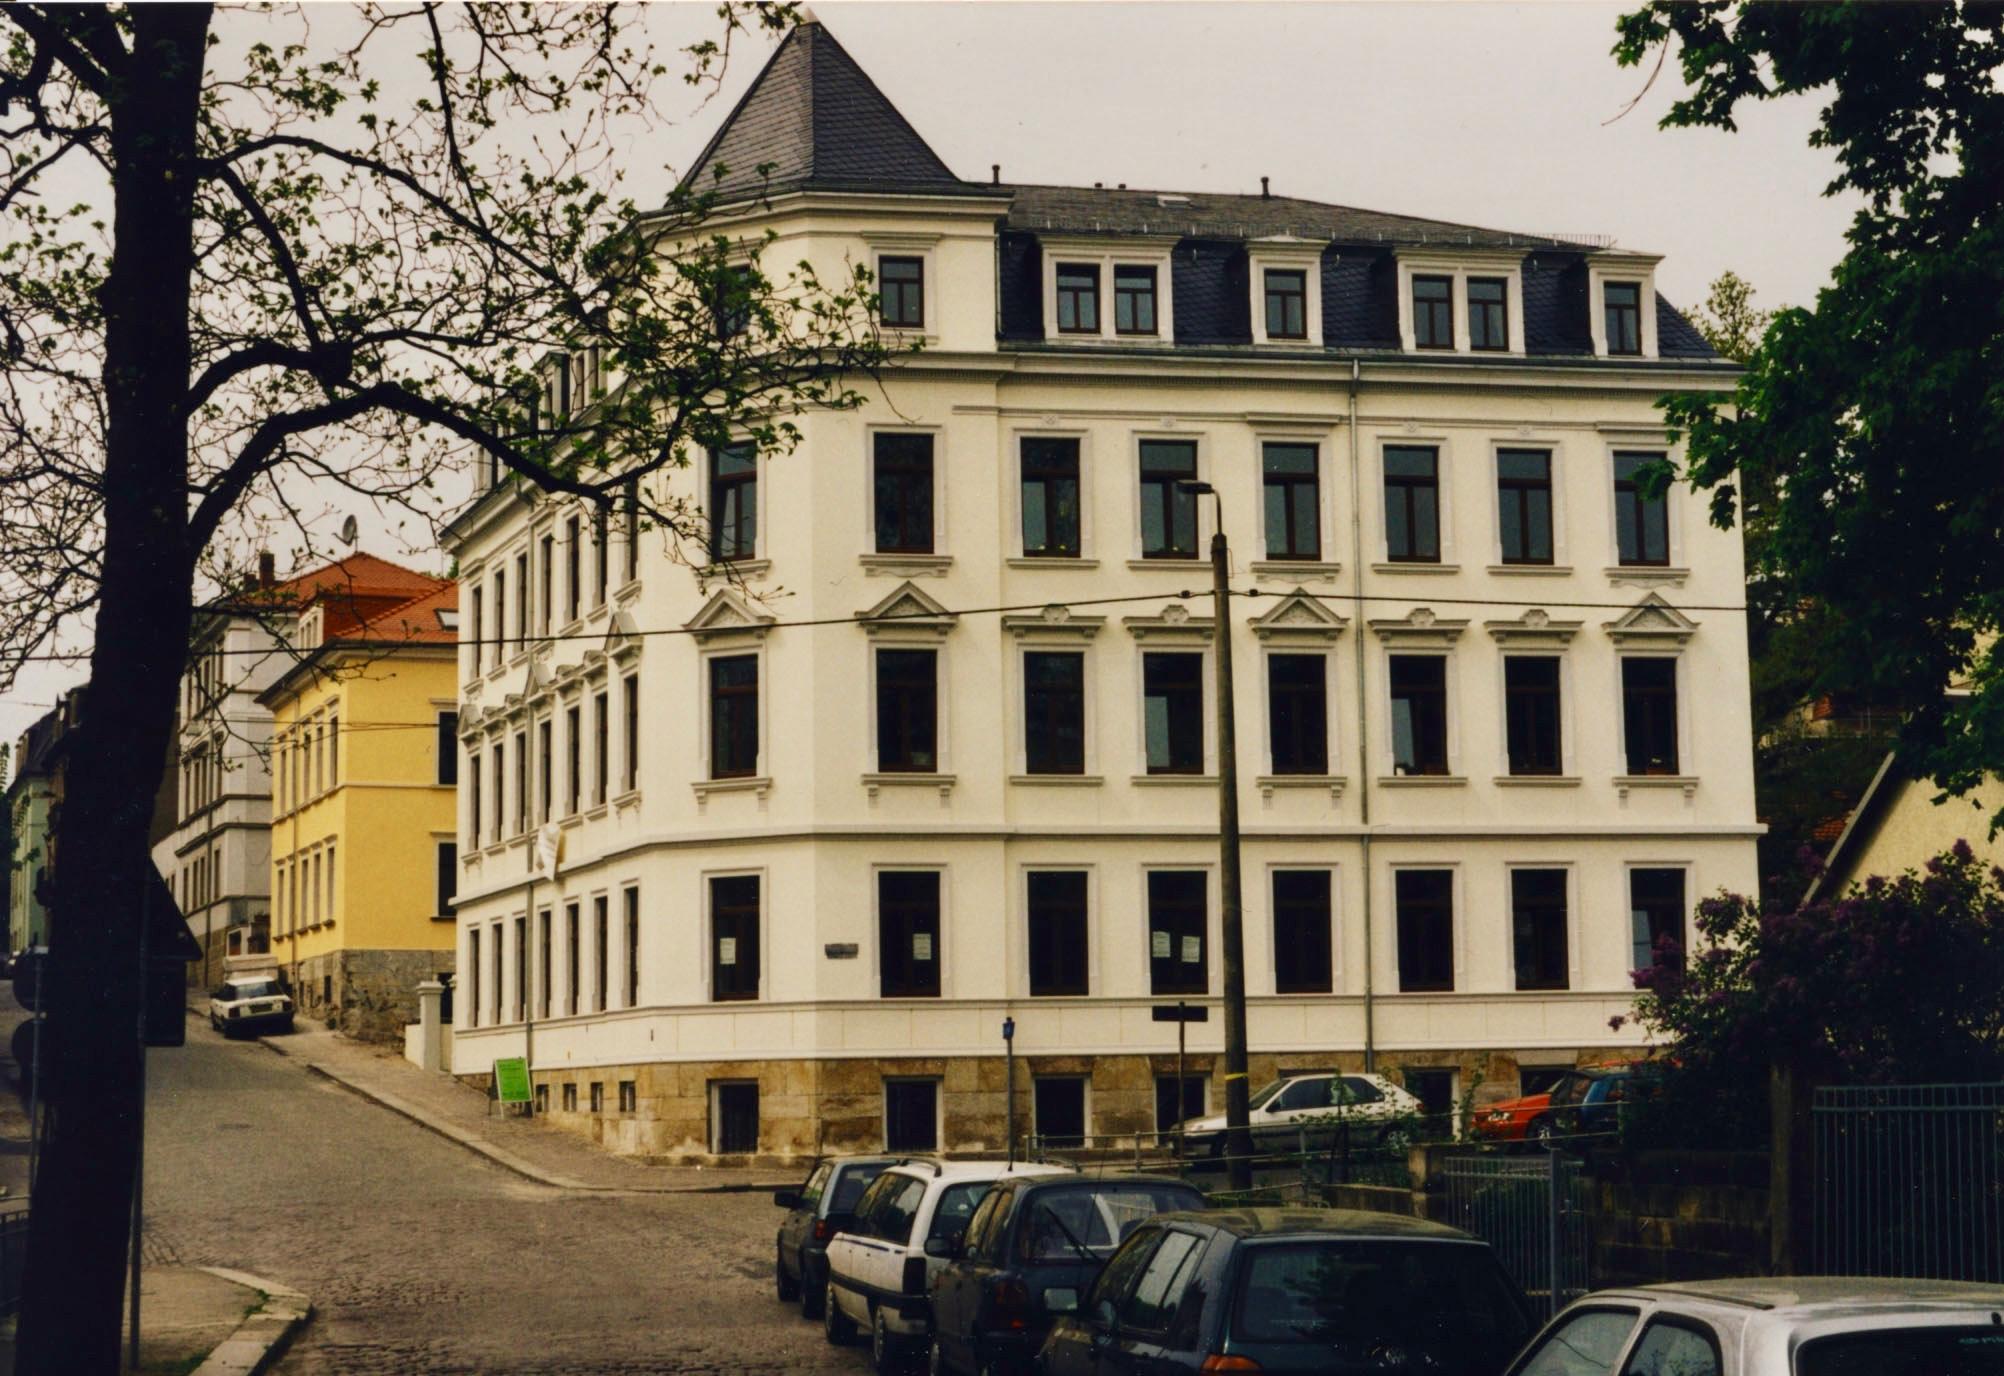 https://architektur-anders.de/wp-content/uploads/2018/06/Nordstr.3.jpg